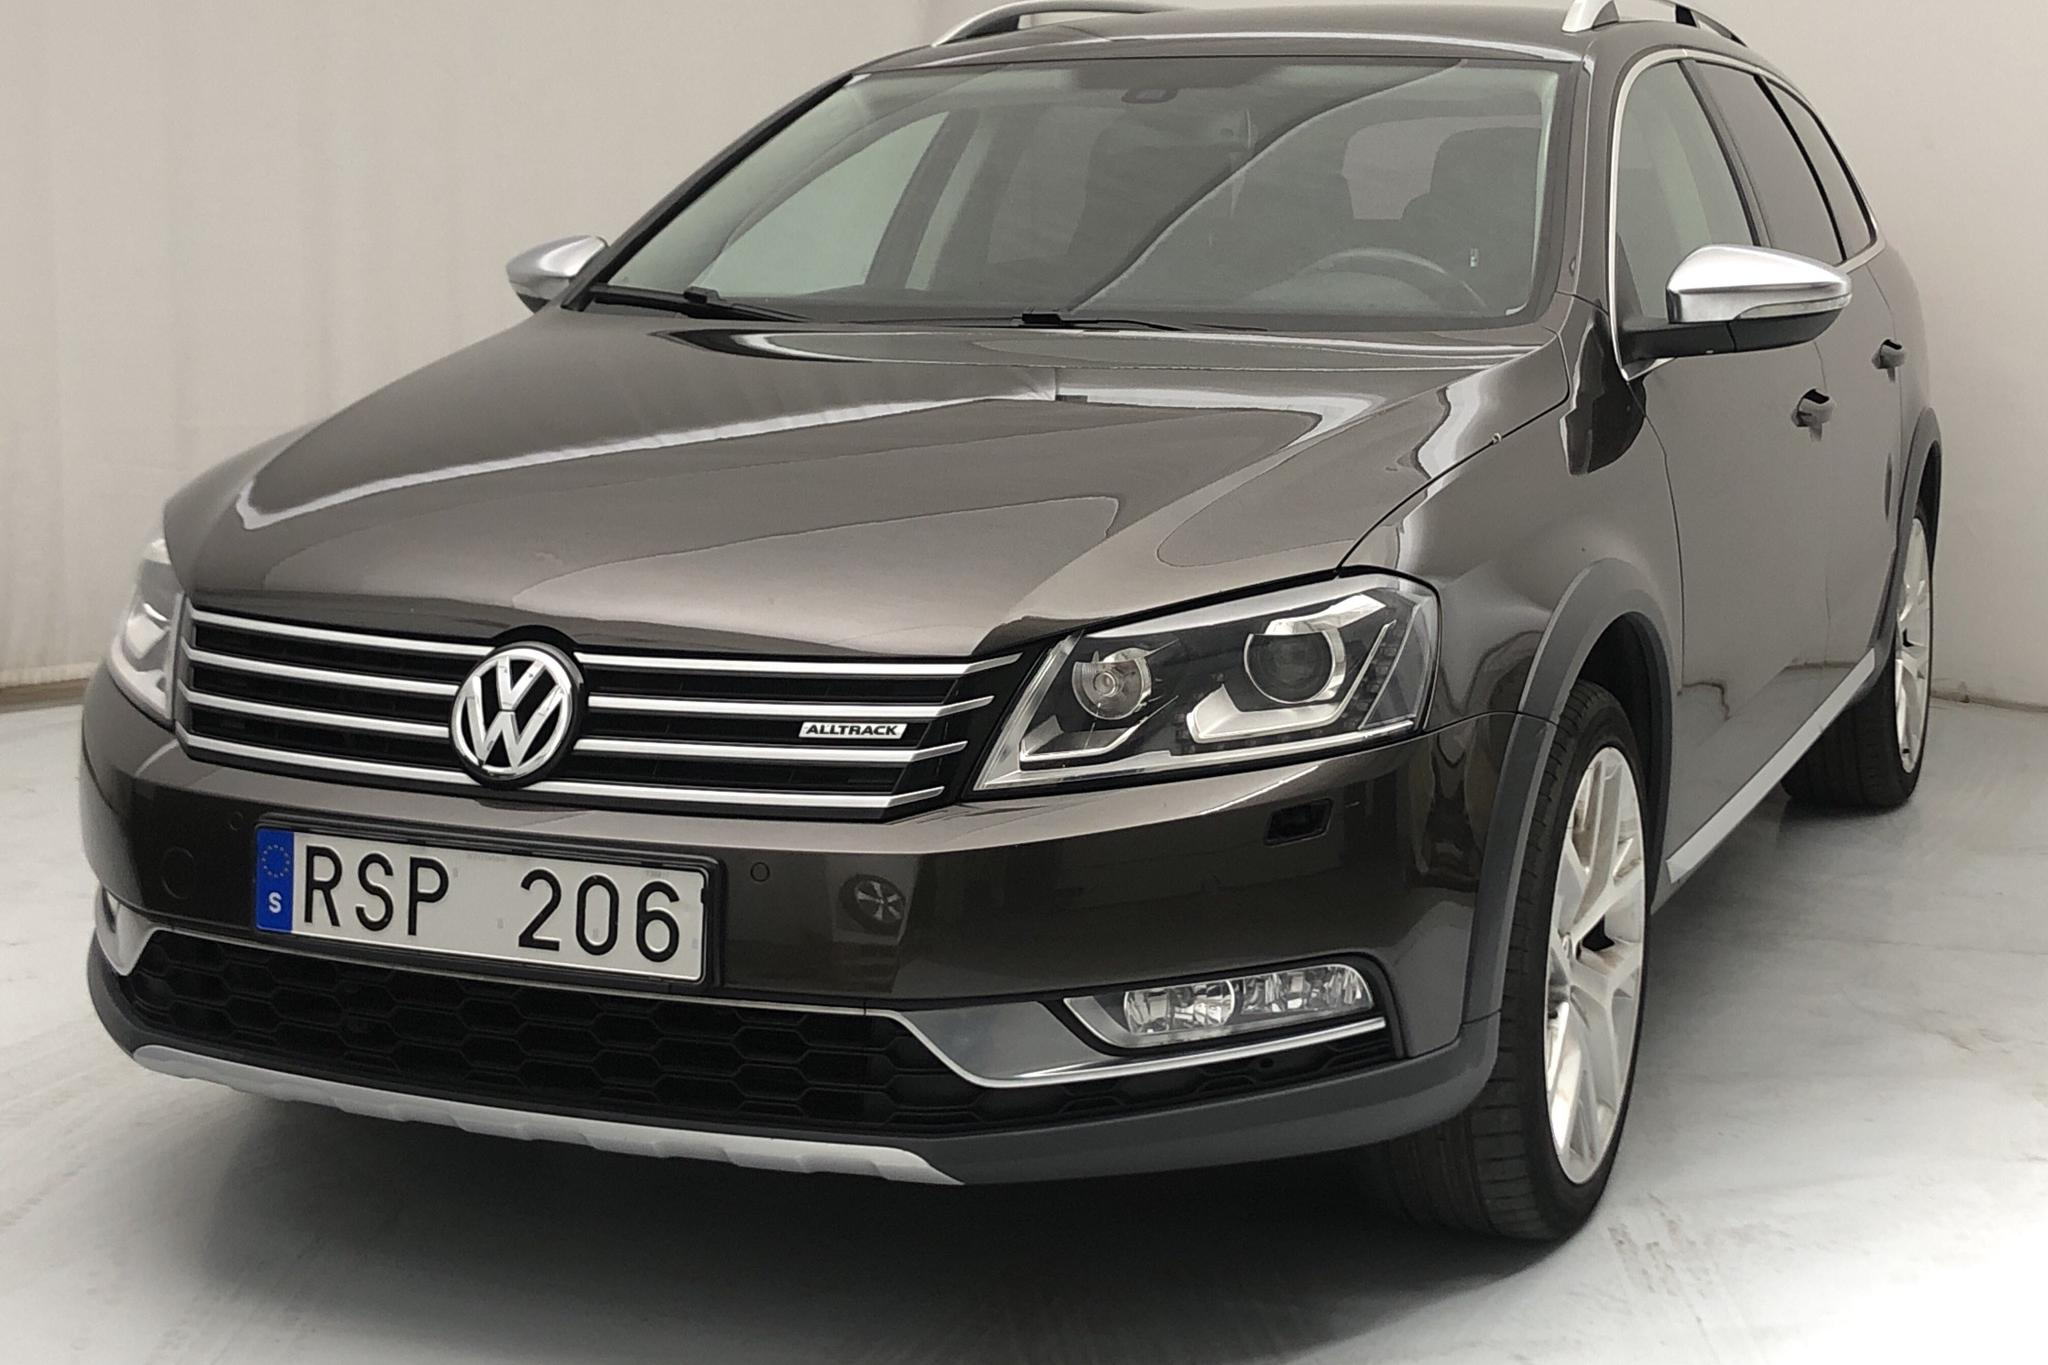 VW Passat Alltrack 2.0 TFSI BlueMotion Technology 4Motion (211hk) - 12 158 mil - Automat - Dark Red - 2014